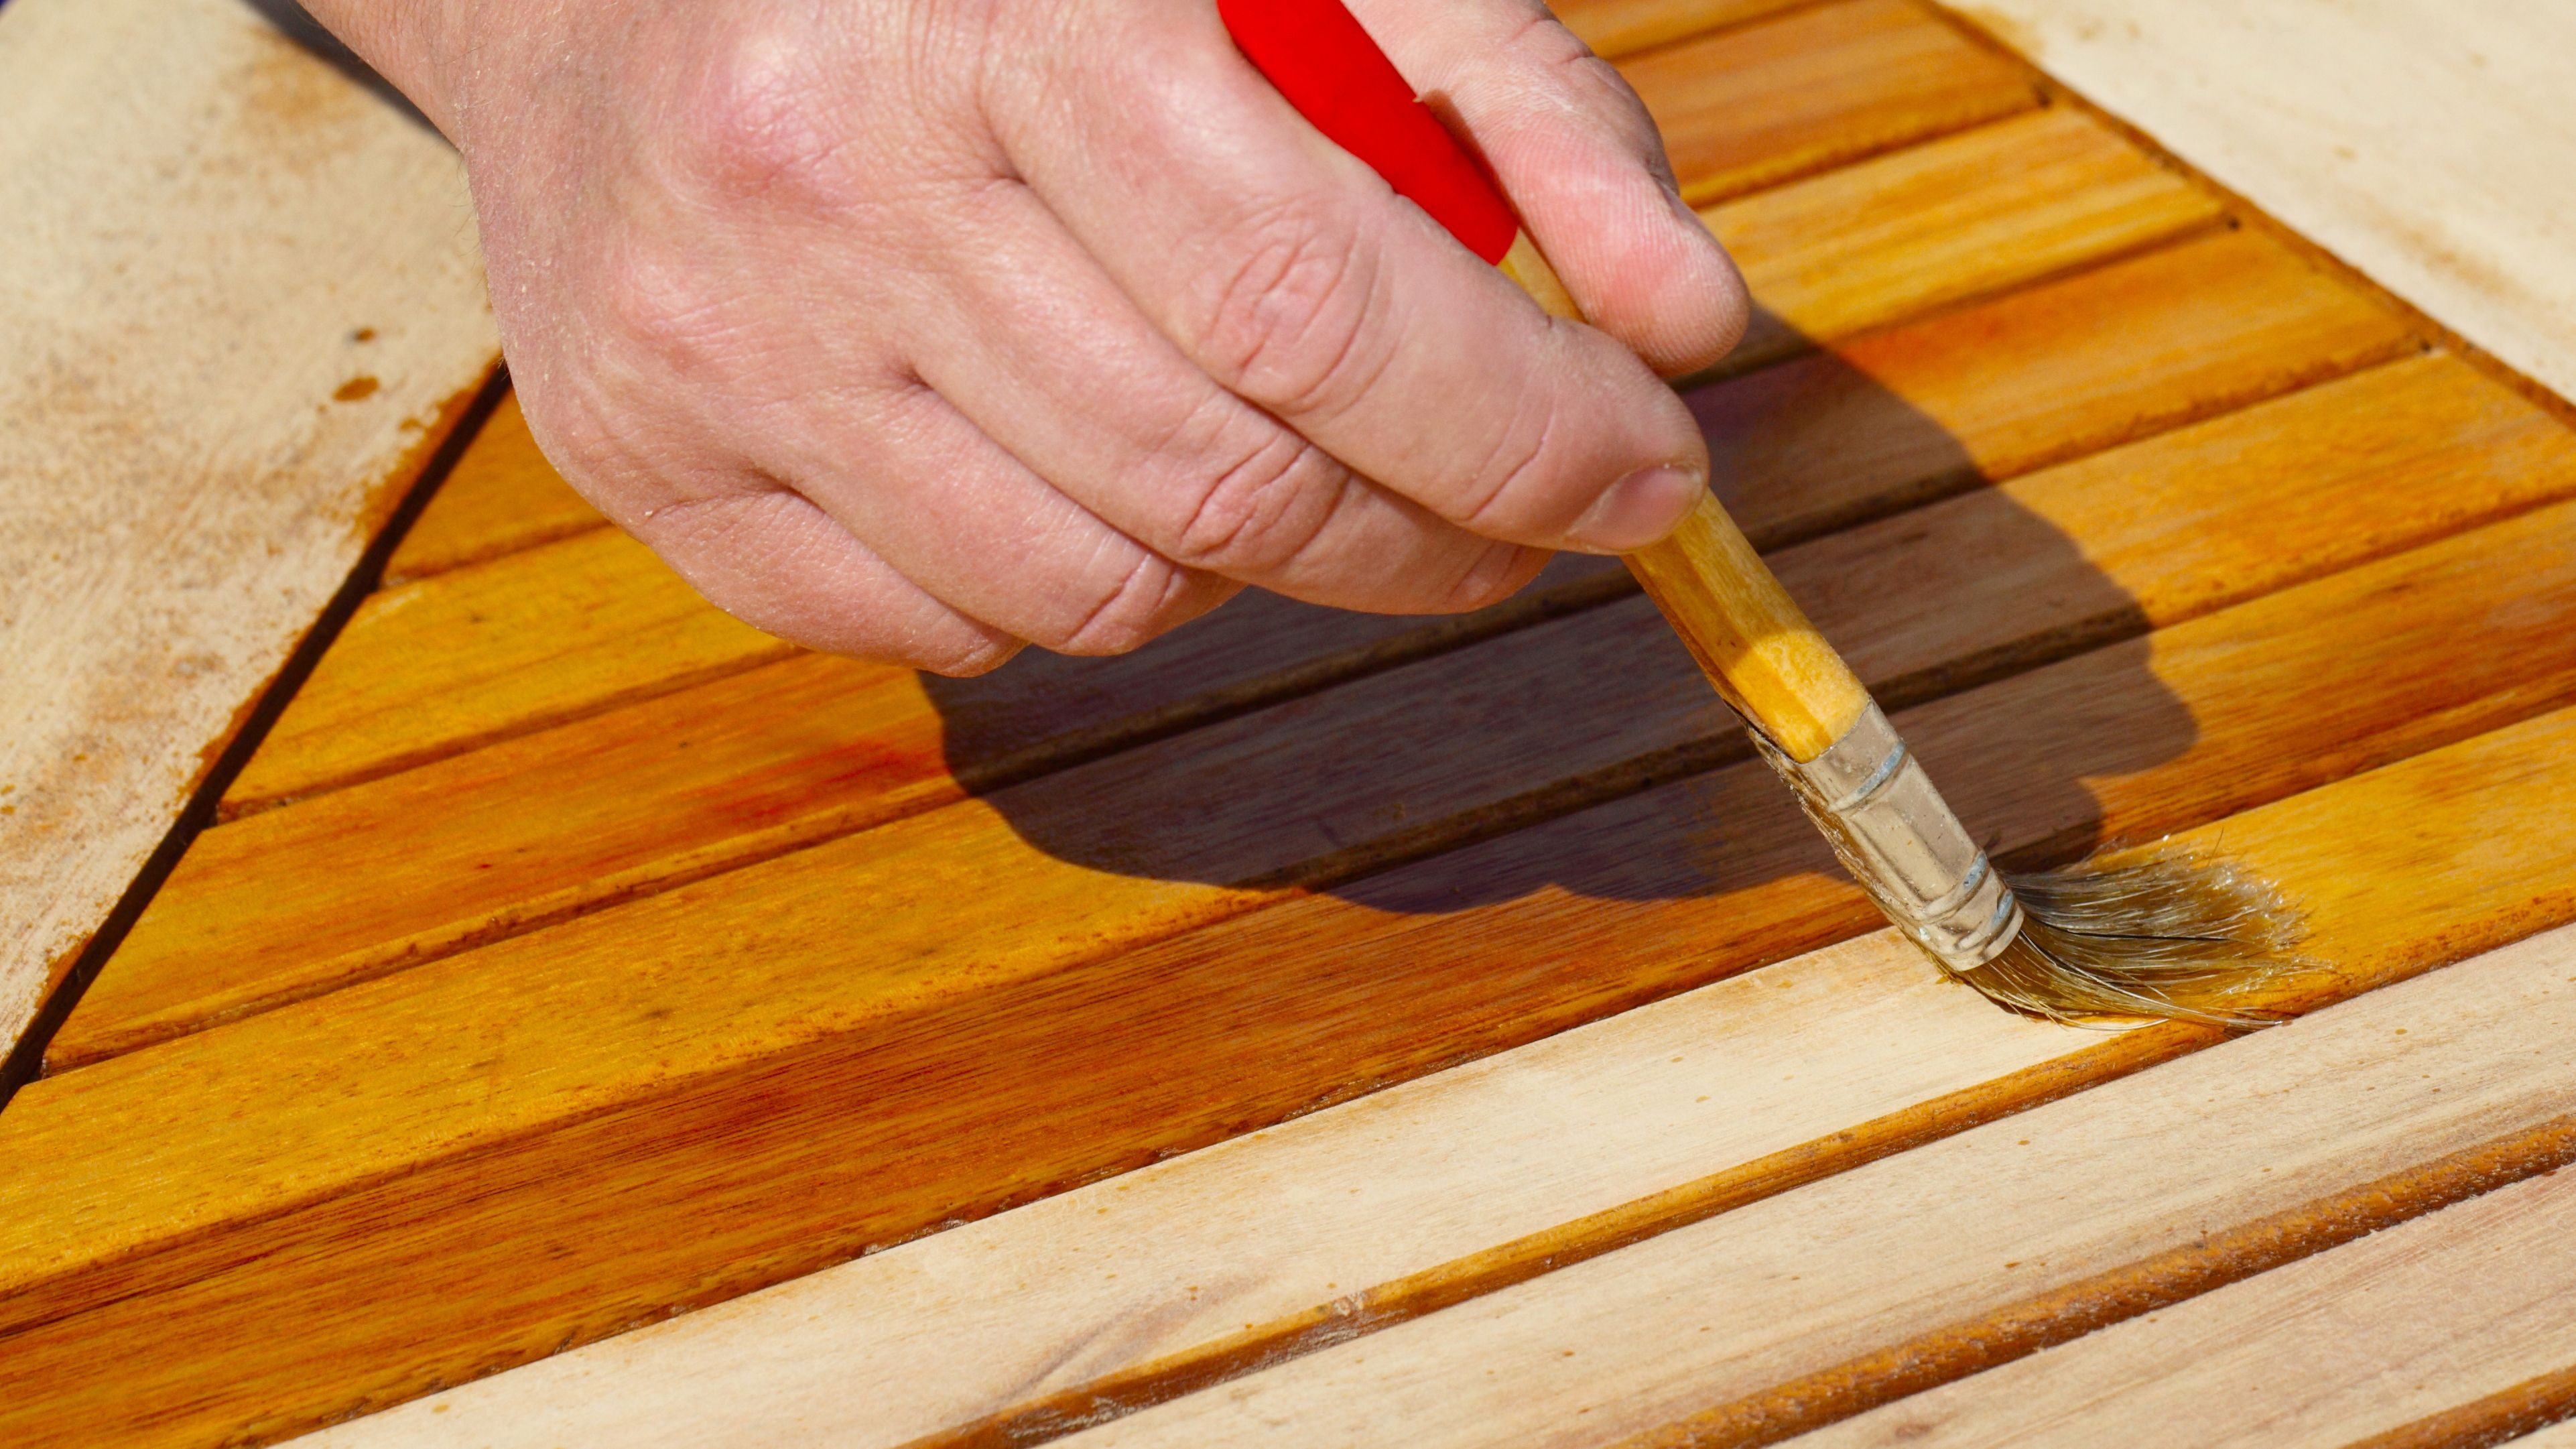 Gartenmöbel aus Teakholz oder Eukalyptus pflegen: So geht's